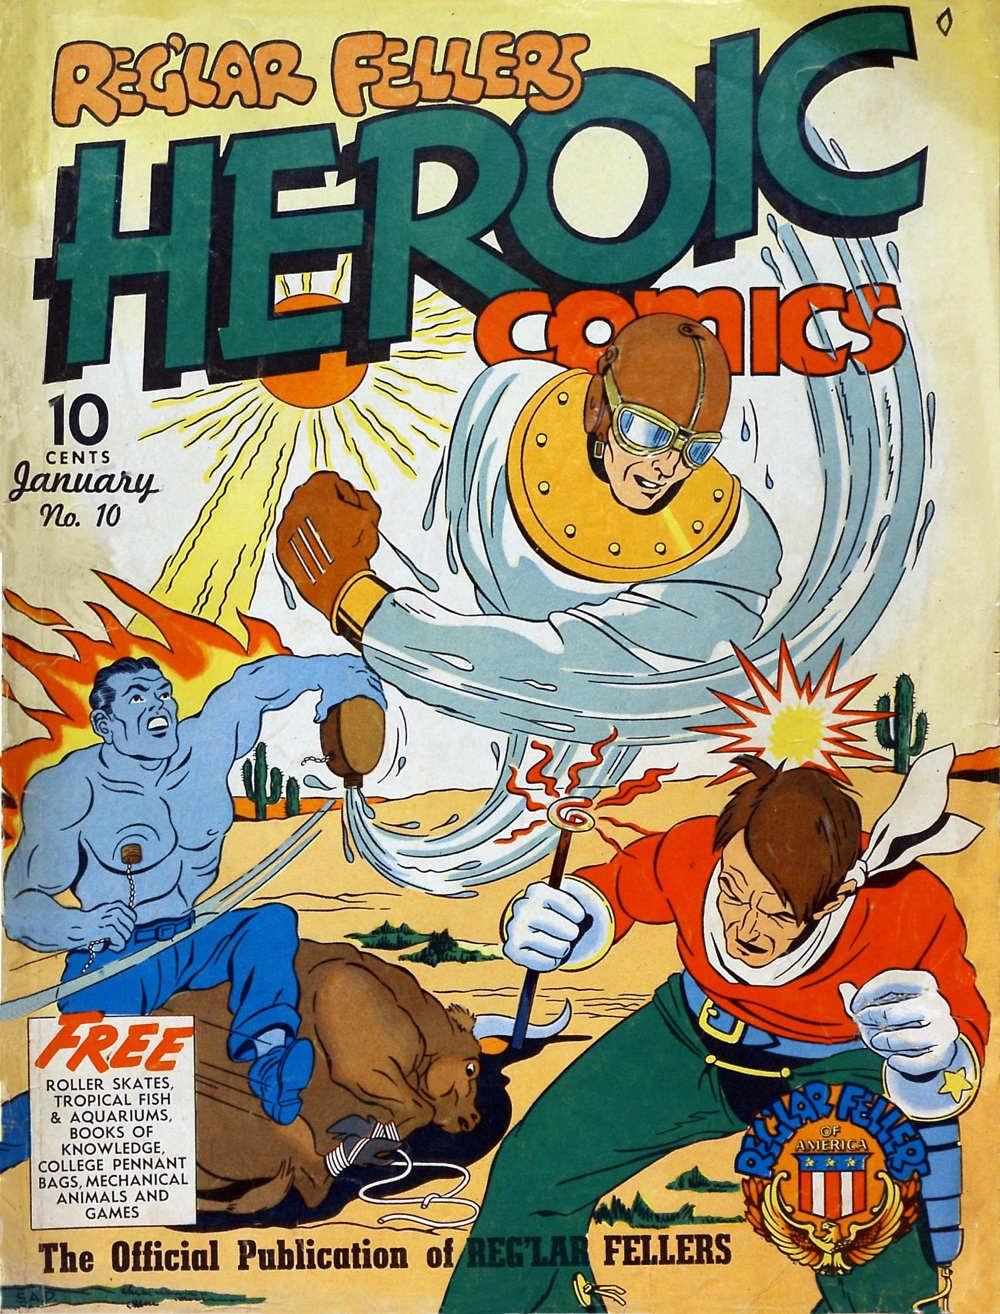 Reglar Fellers Heroic Comics issue 10 - Page 1